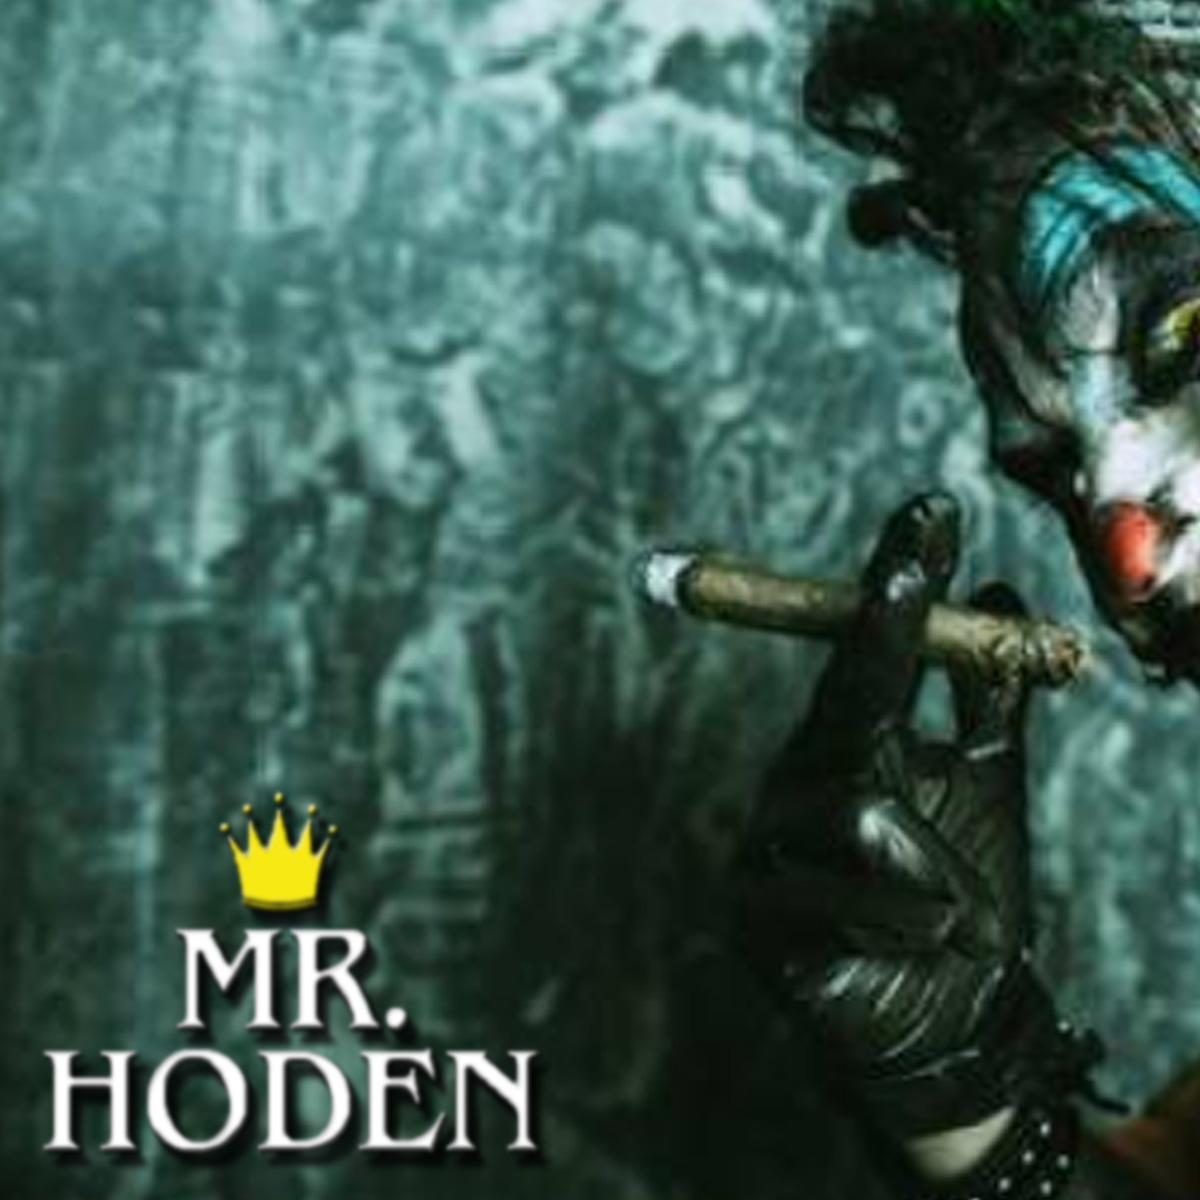 Upcoming: Mr. Hoden - Banger Psycho Rap Beat 2020 [FREE BEAT]